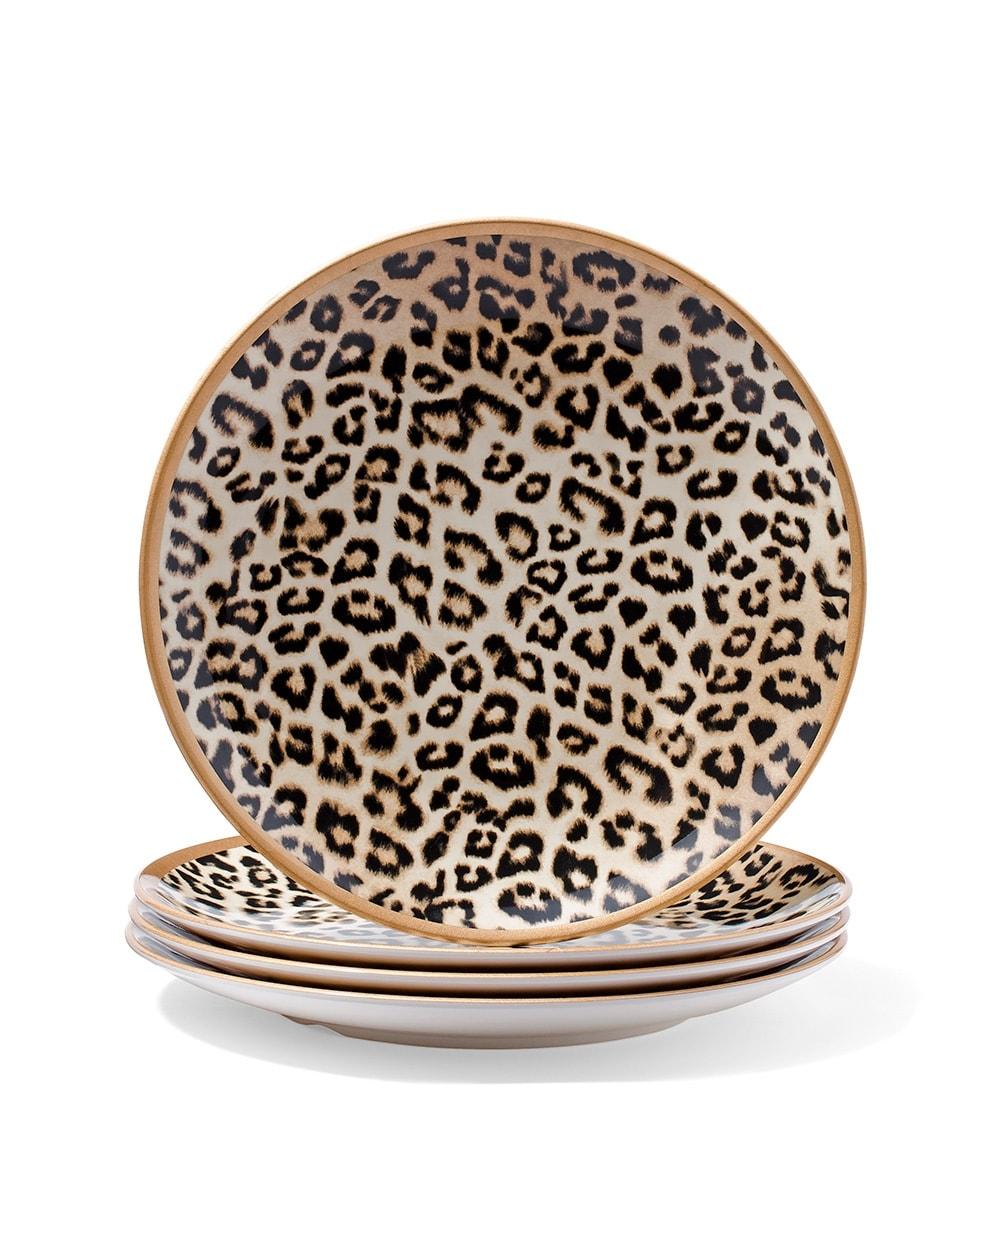 large leopard-print plate set - chico's